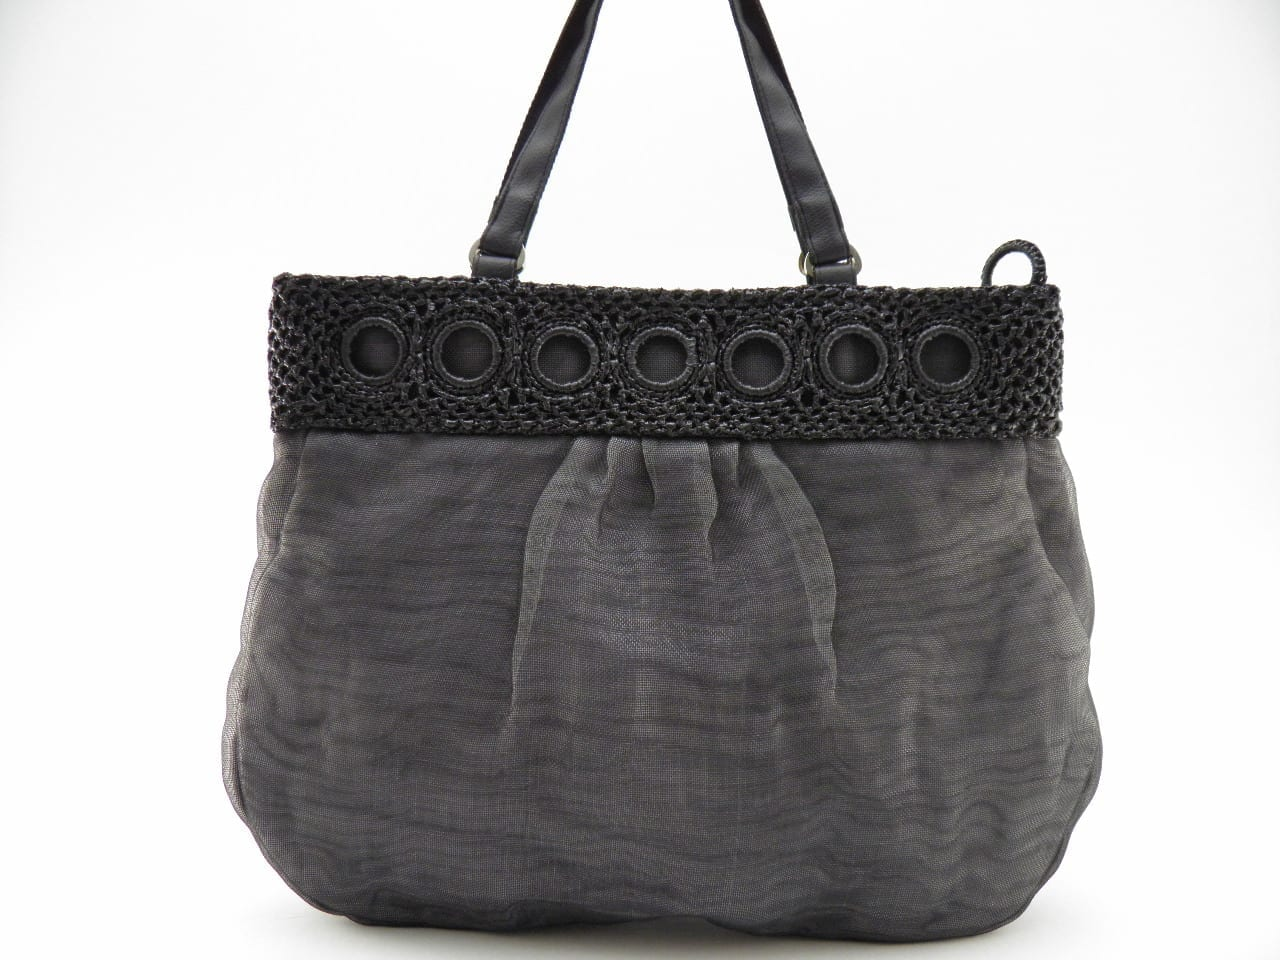 arial eco friendly handbag bil p storeman. Black Bedroom Furniture Sets. Home Design Ideas